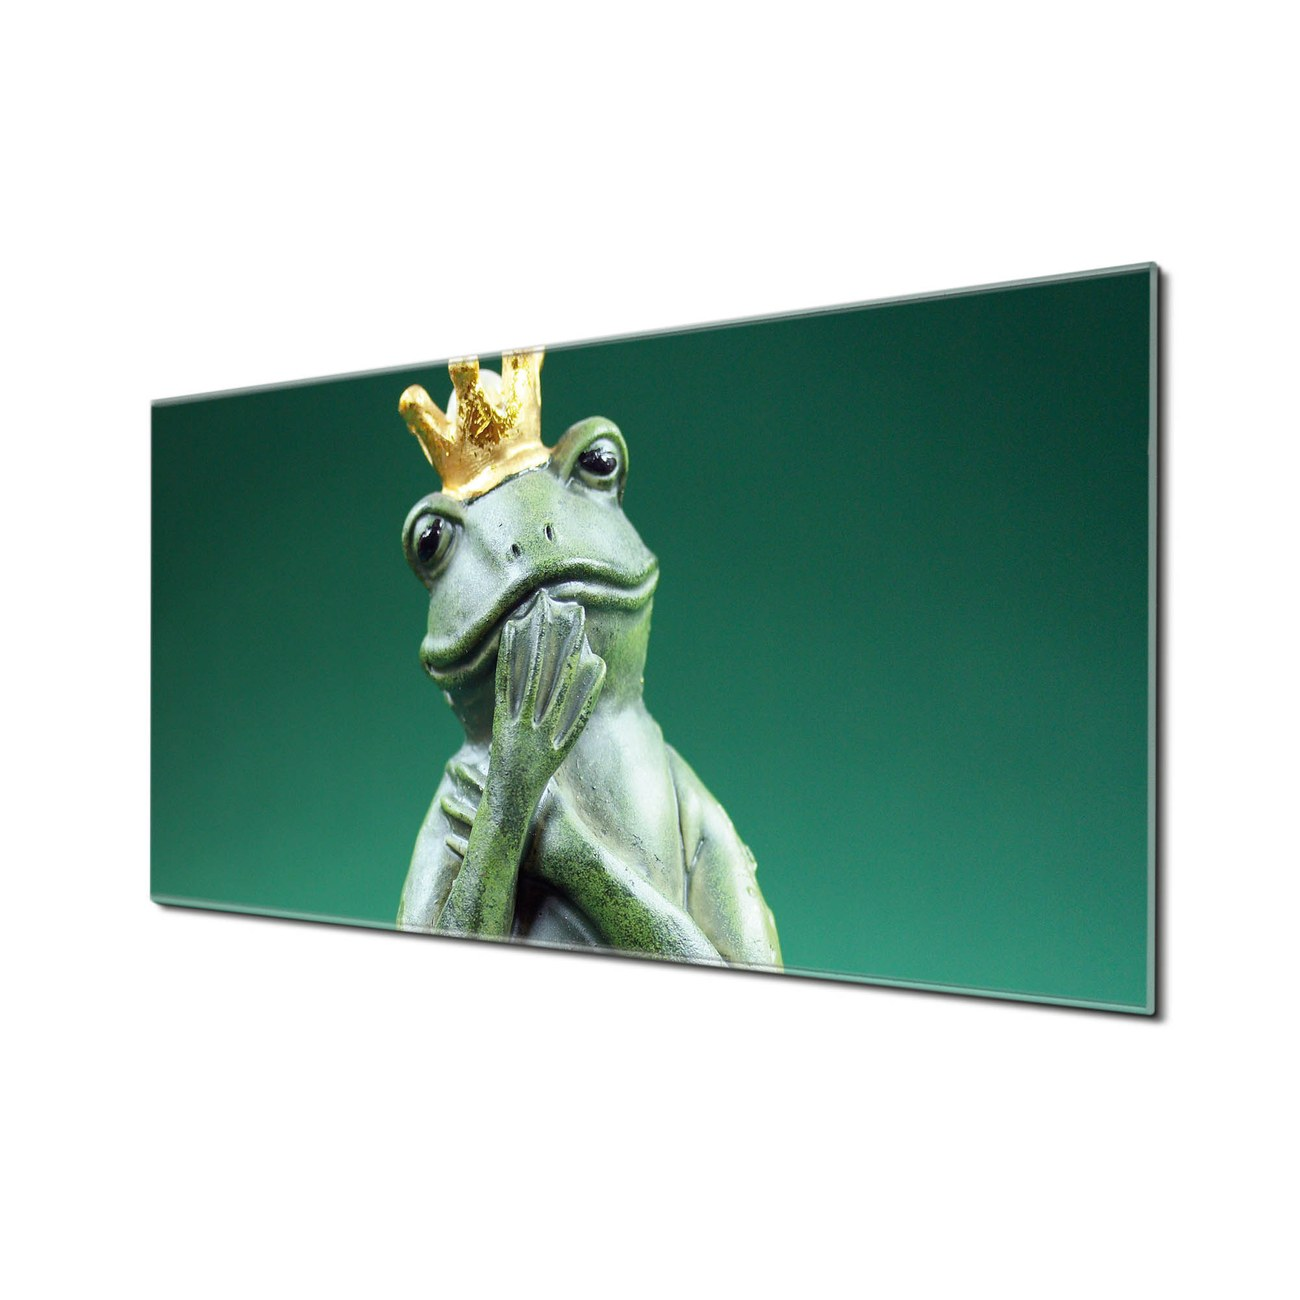 Küchenrückwand Glas Motiv Froschkönig